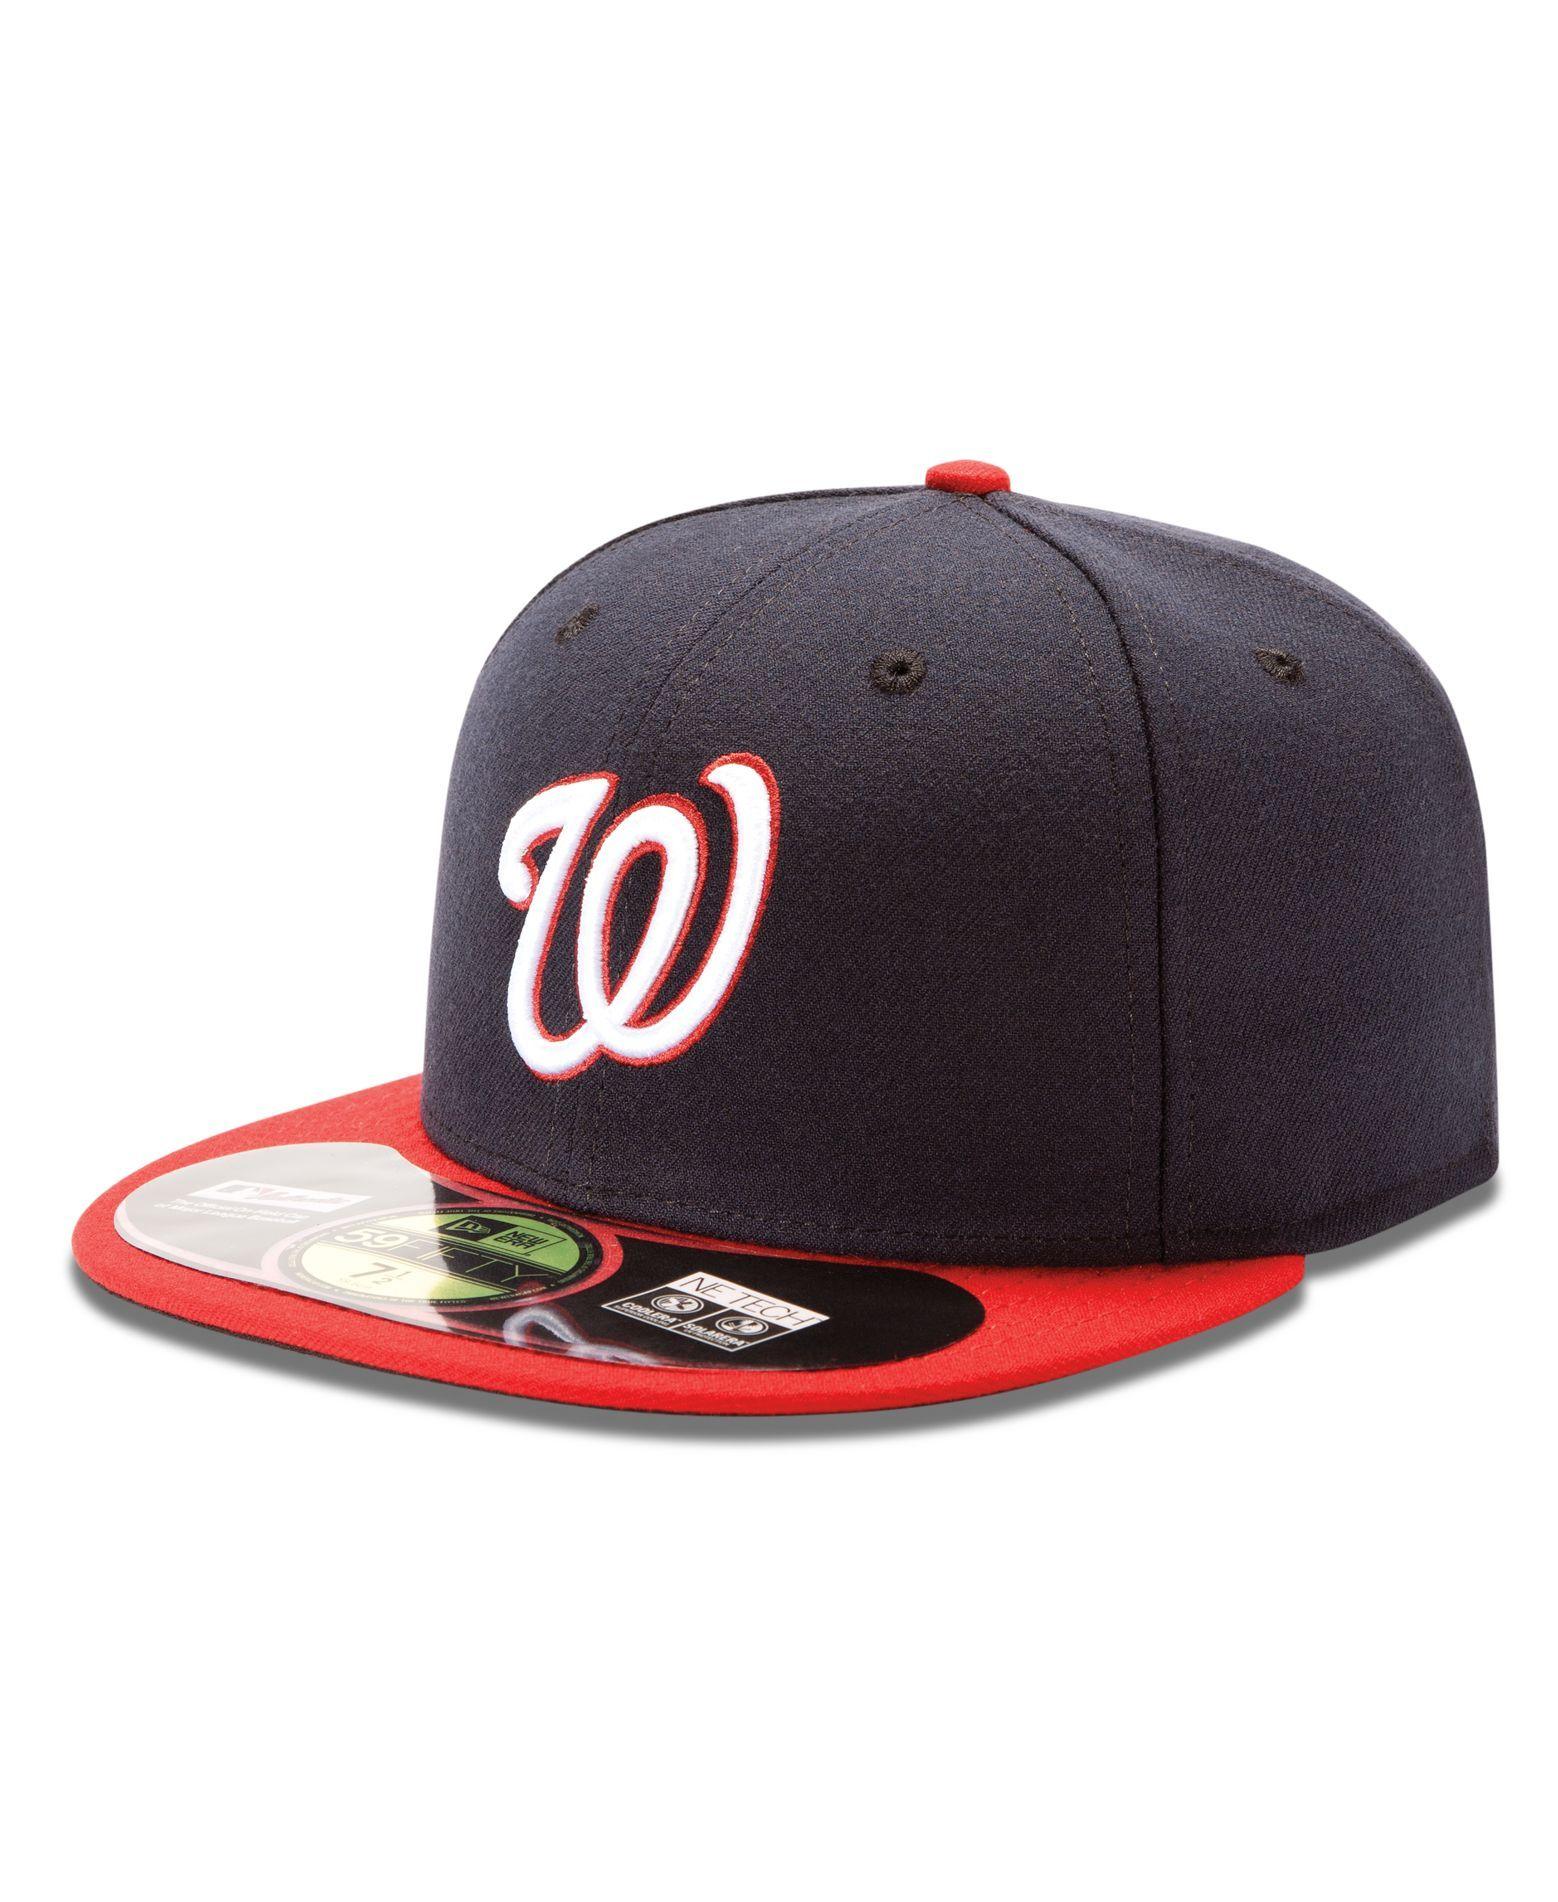 uk availability db05e 949b2 New Era Mlb Hat, Washington Nationals On Field 59FIFTY Cap